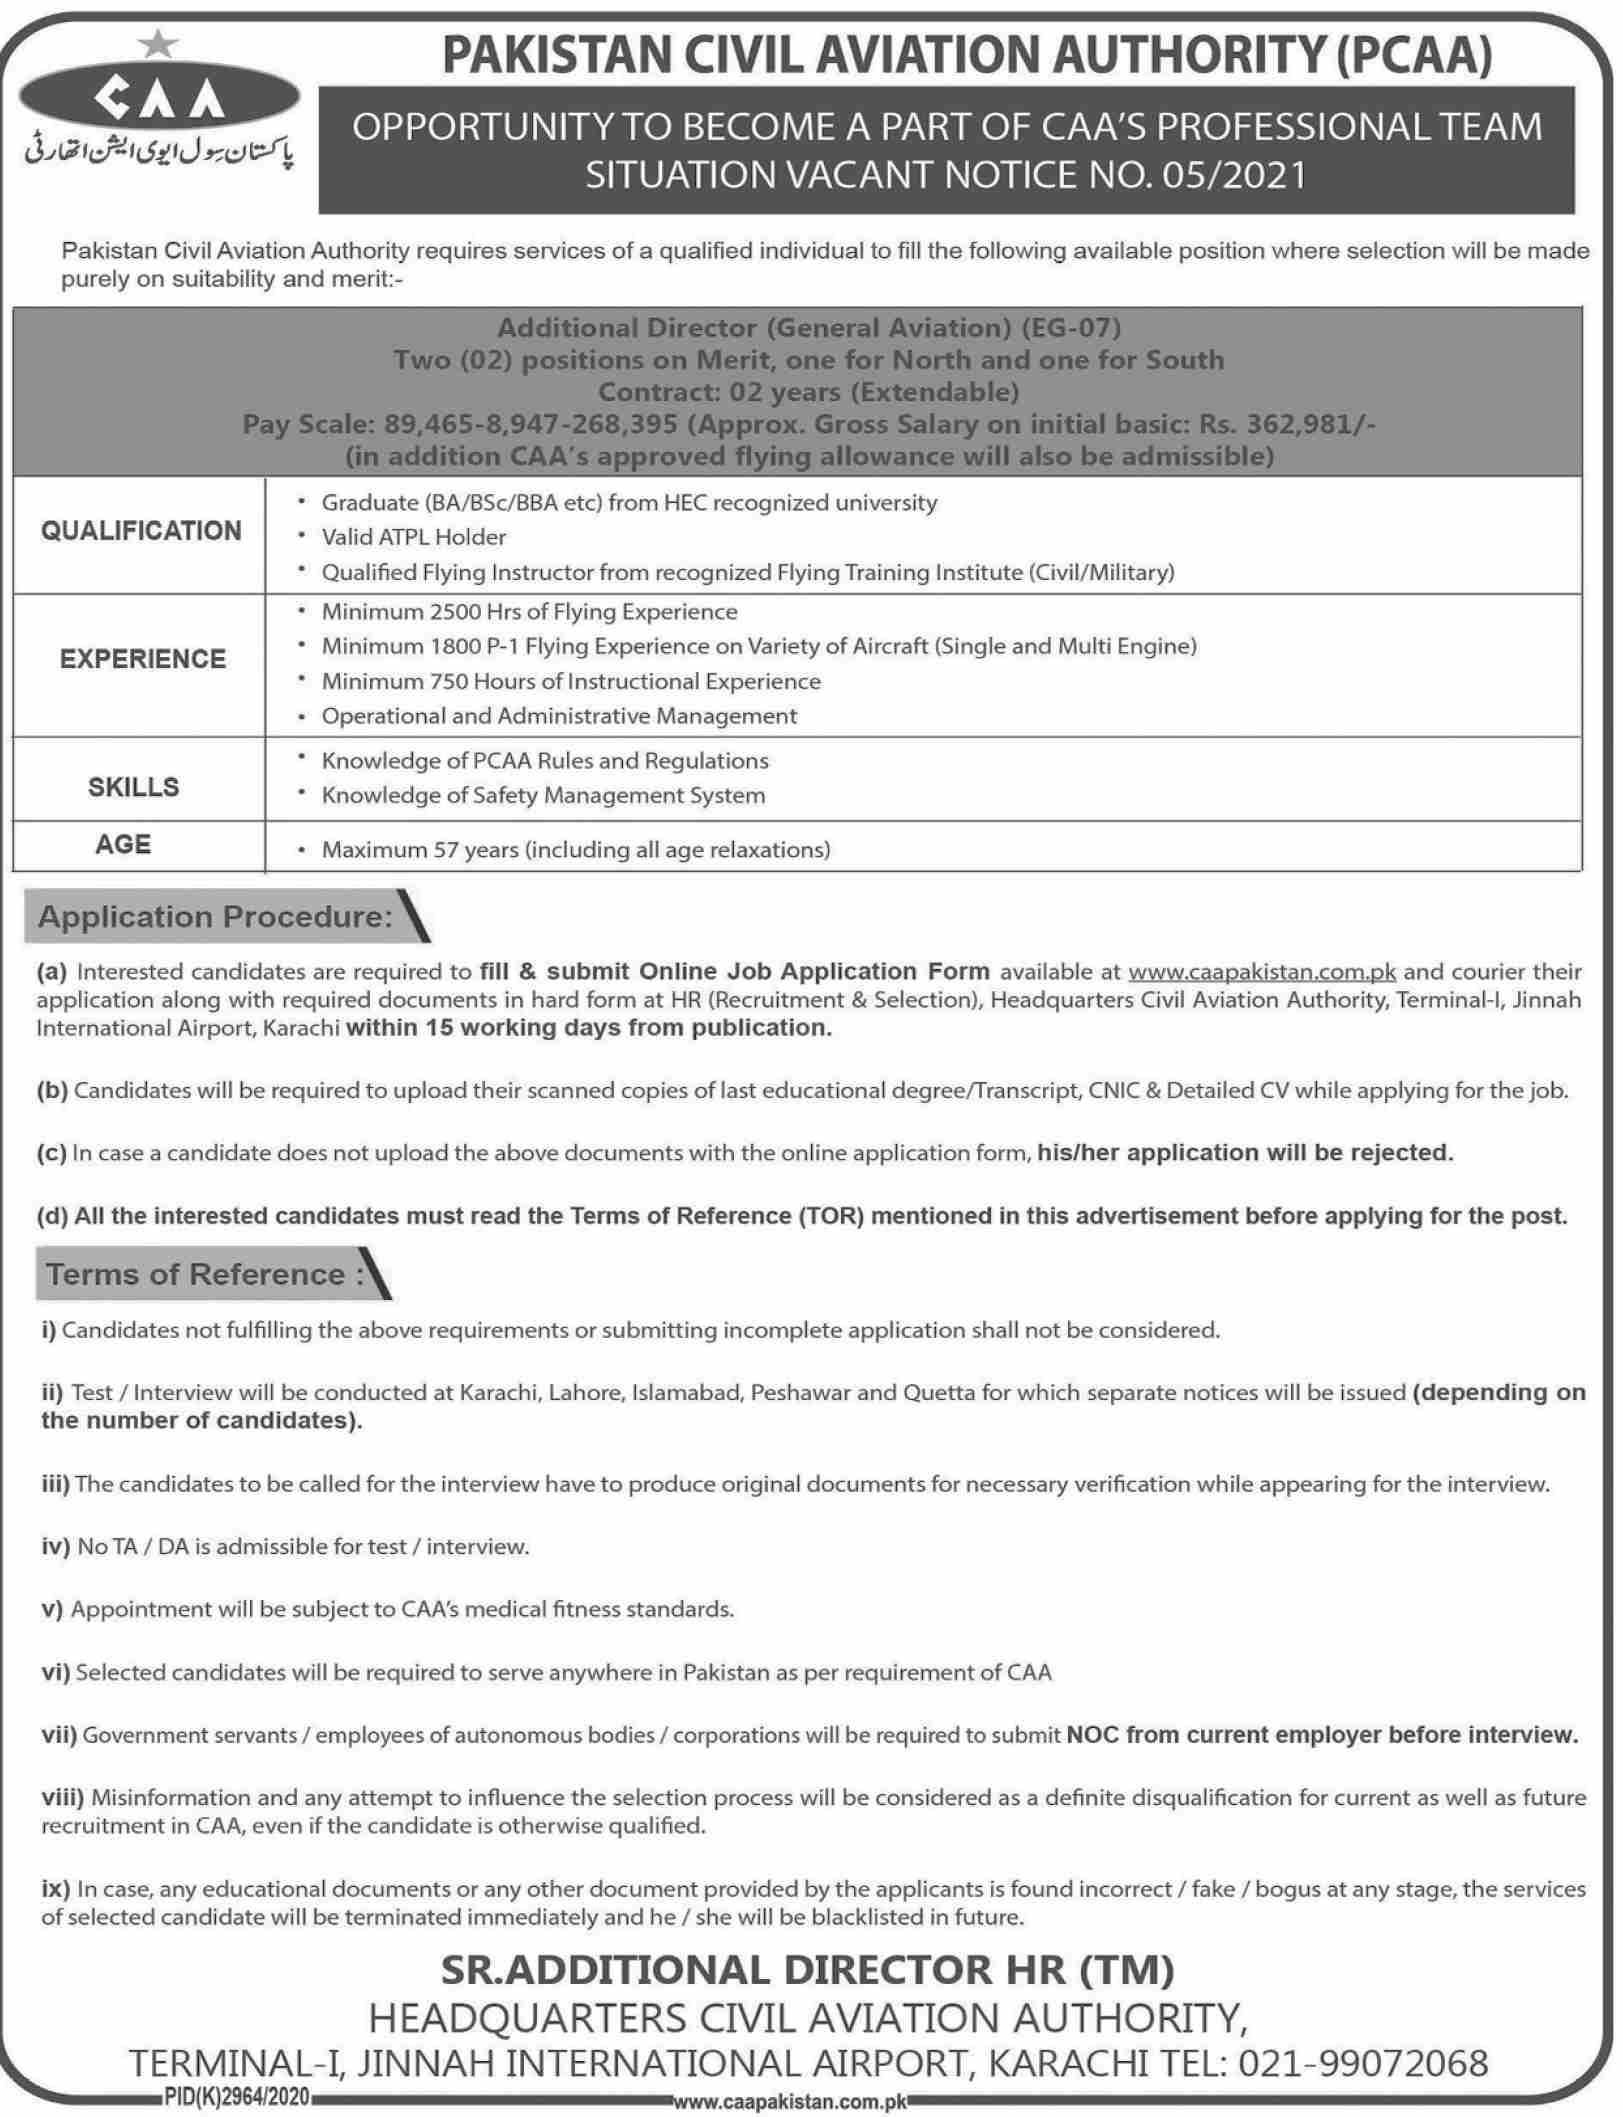 Pakistan Civil Aviation Authority (PCAA) Jobs May 2021